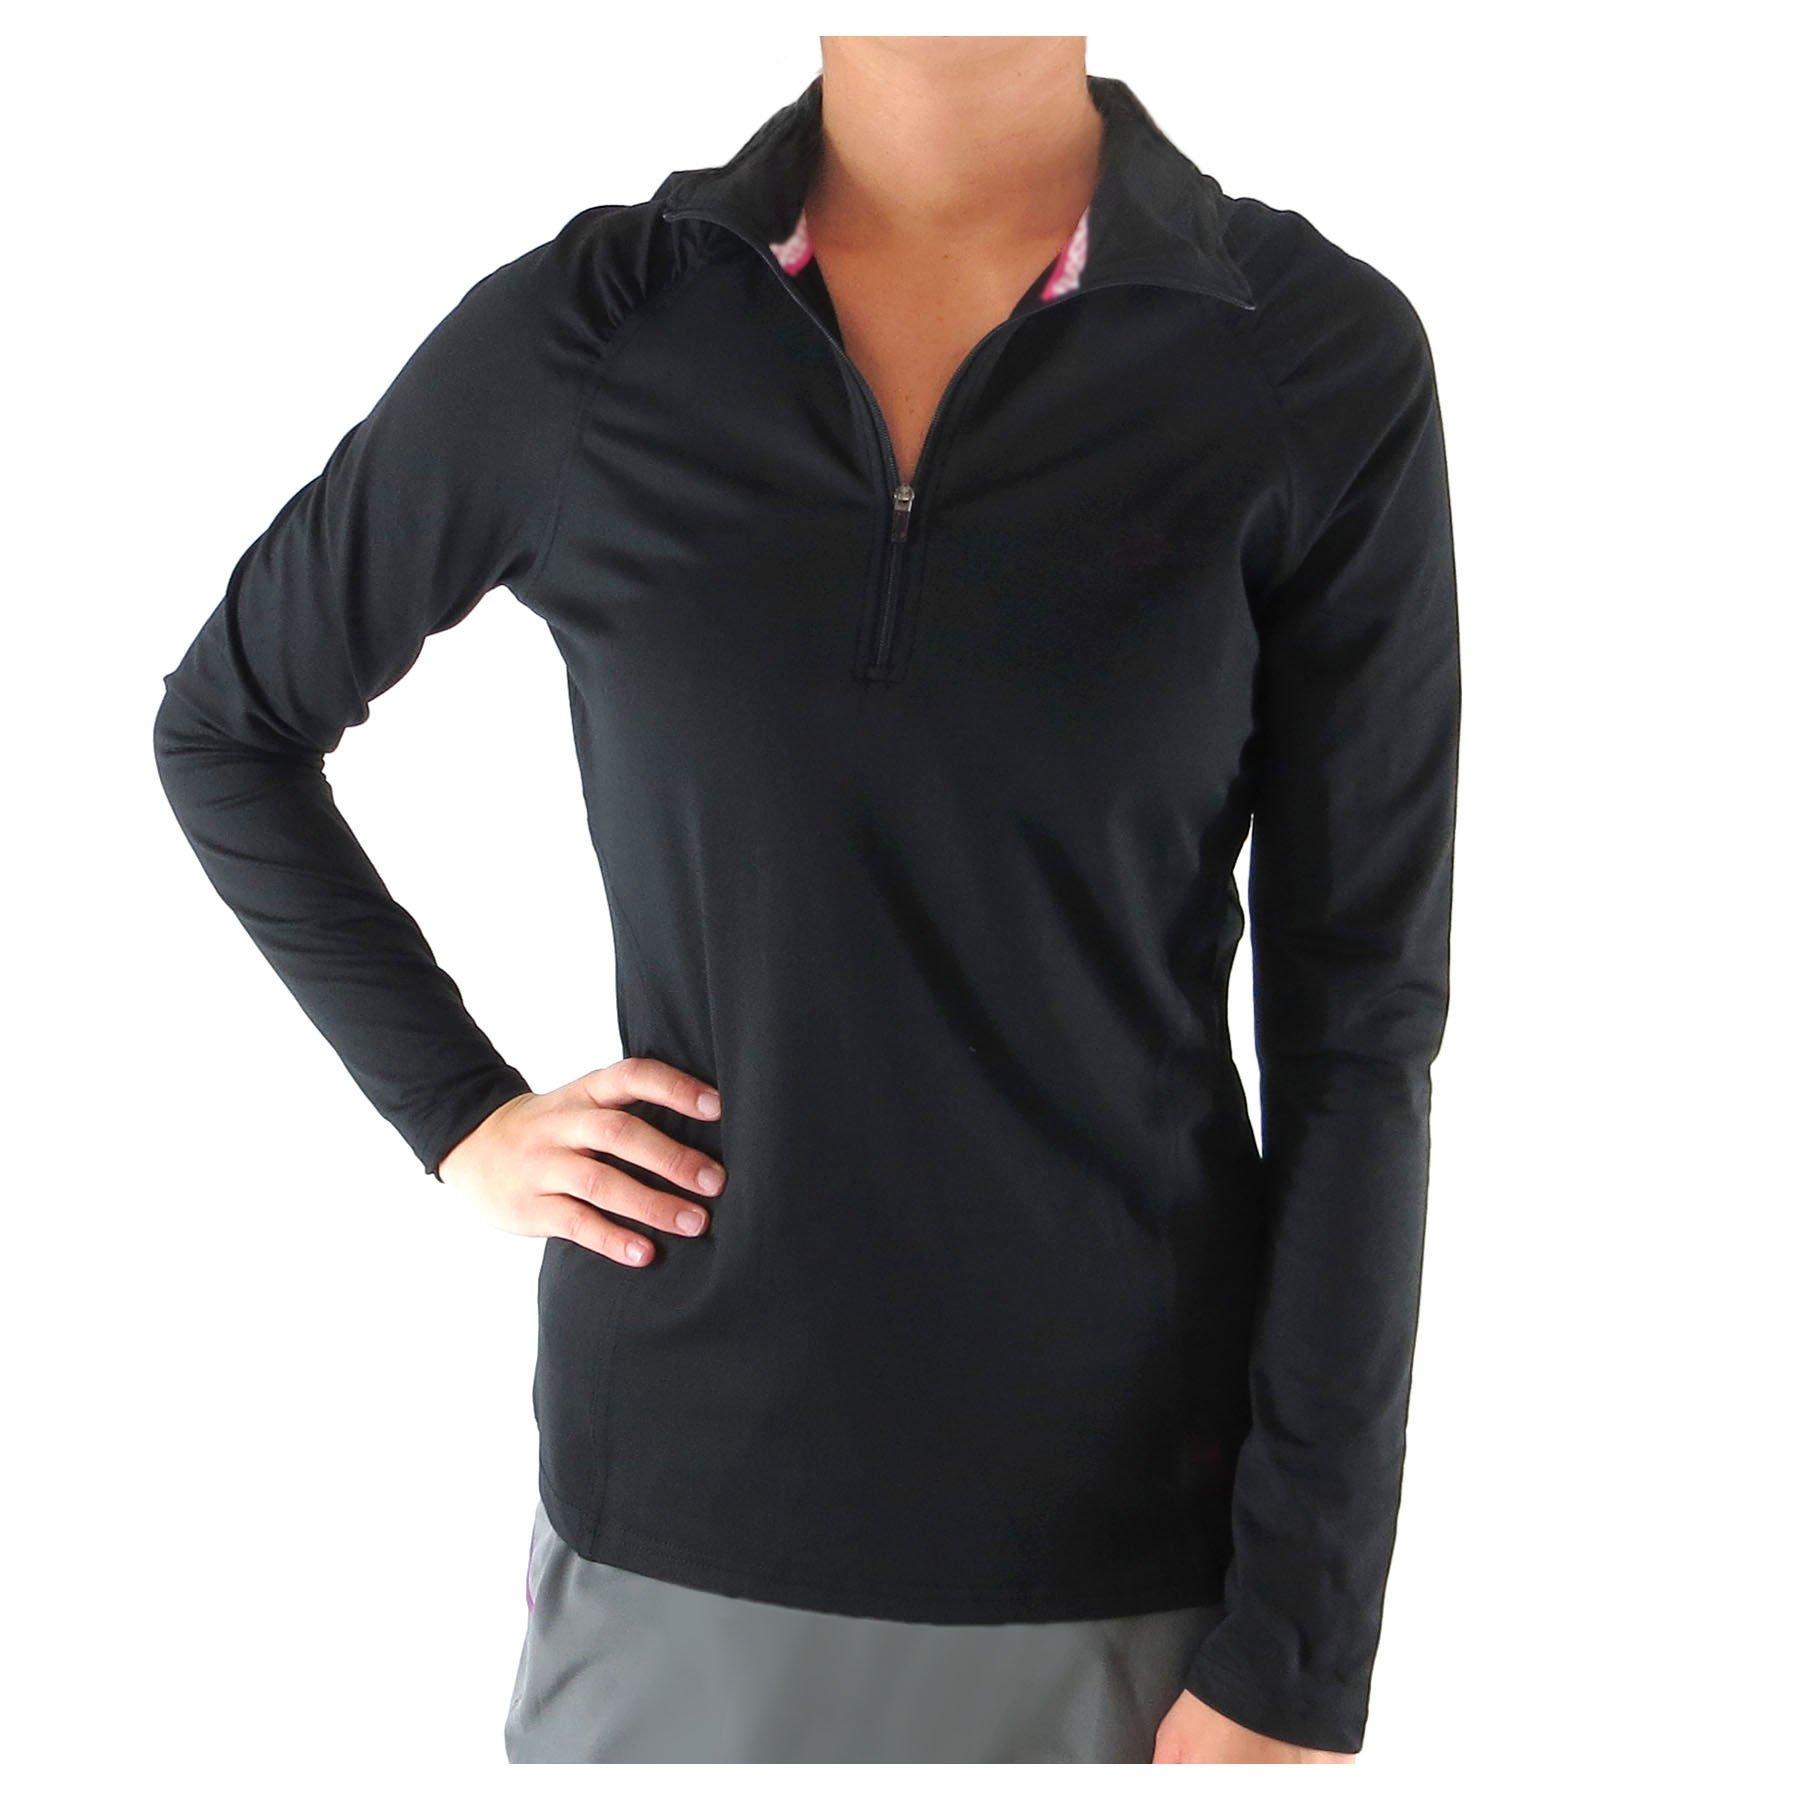 Alex + Abby Women's Essential Pullover Small Black